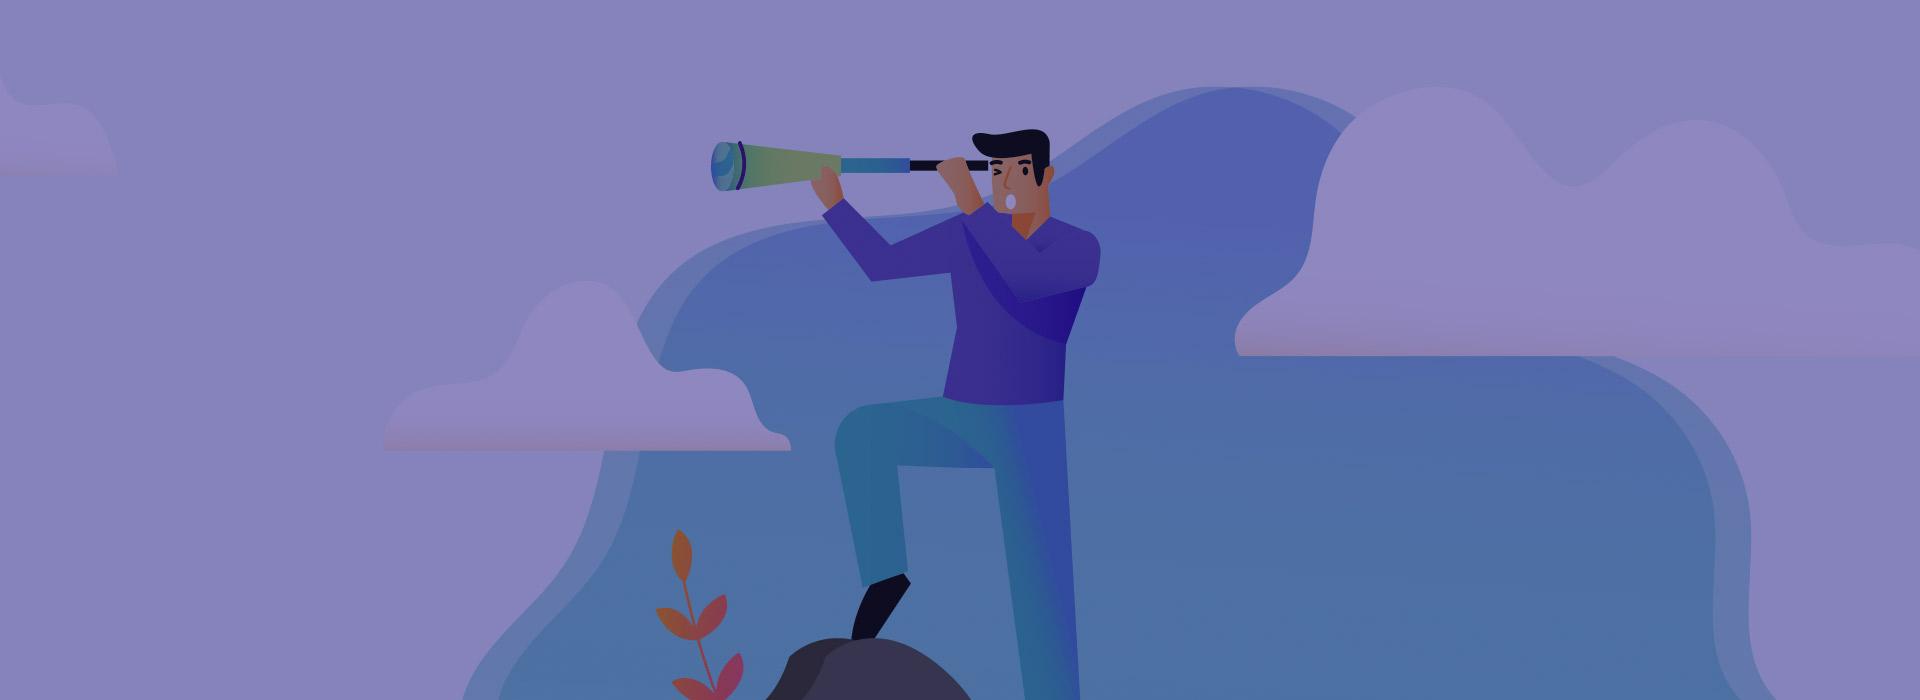 Animated man with telescope